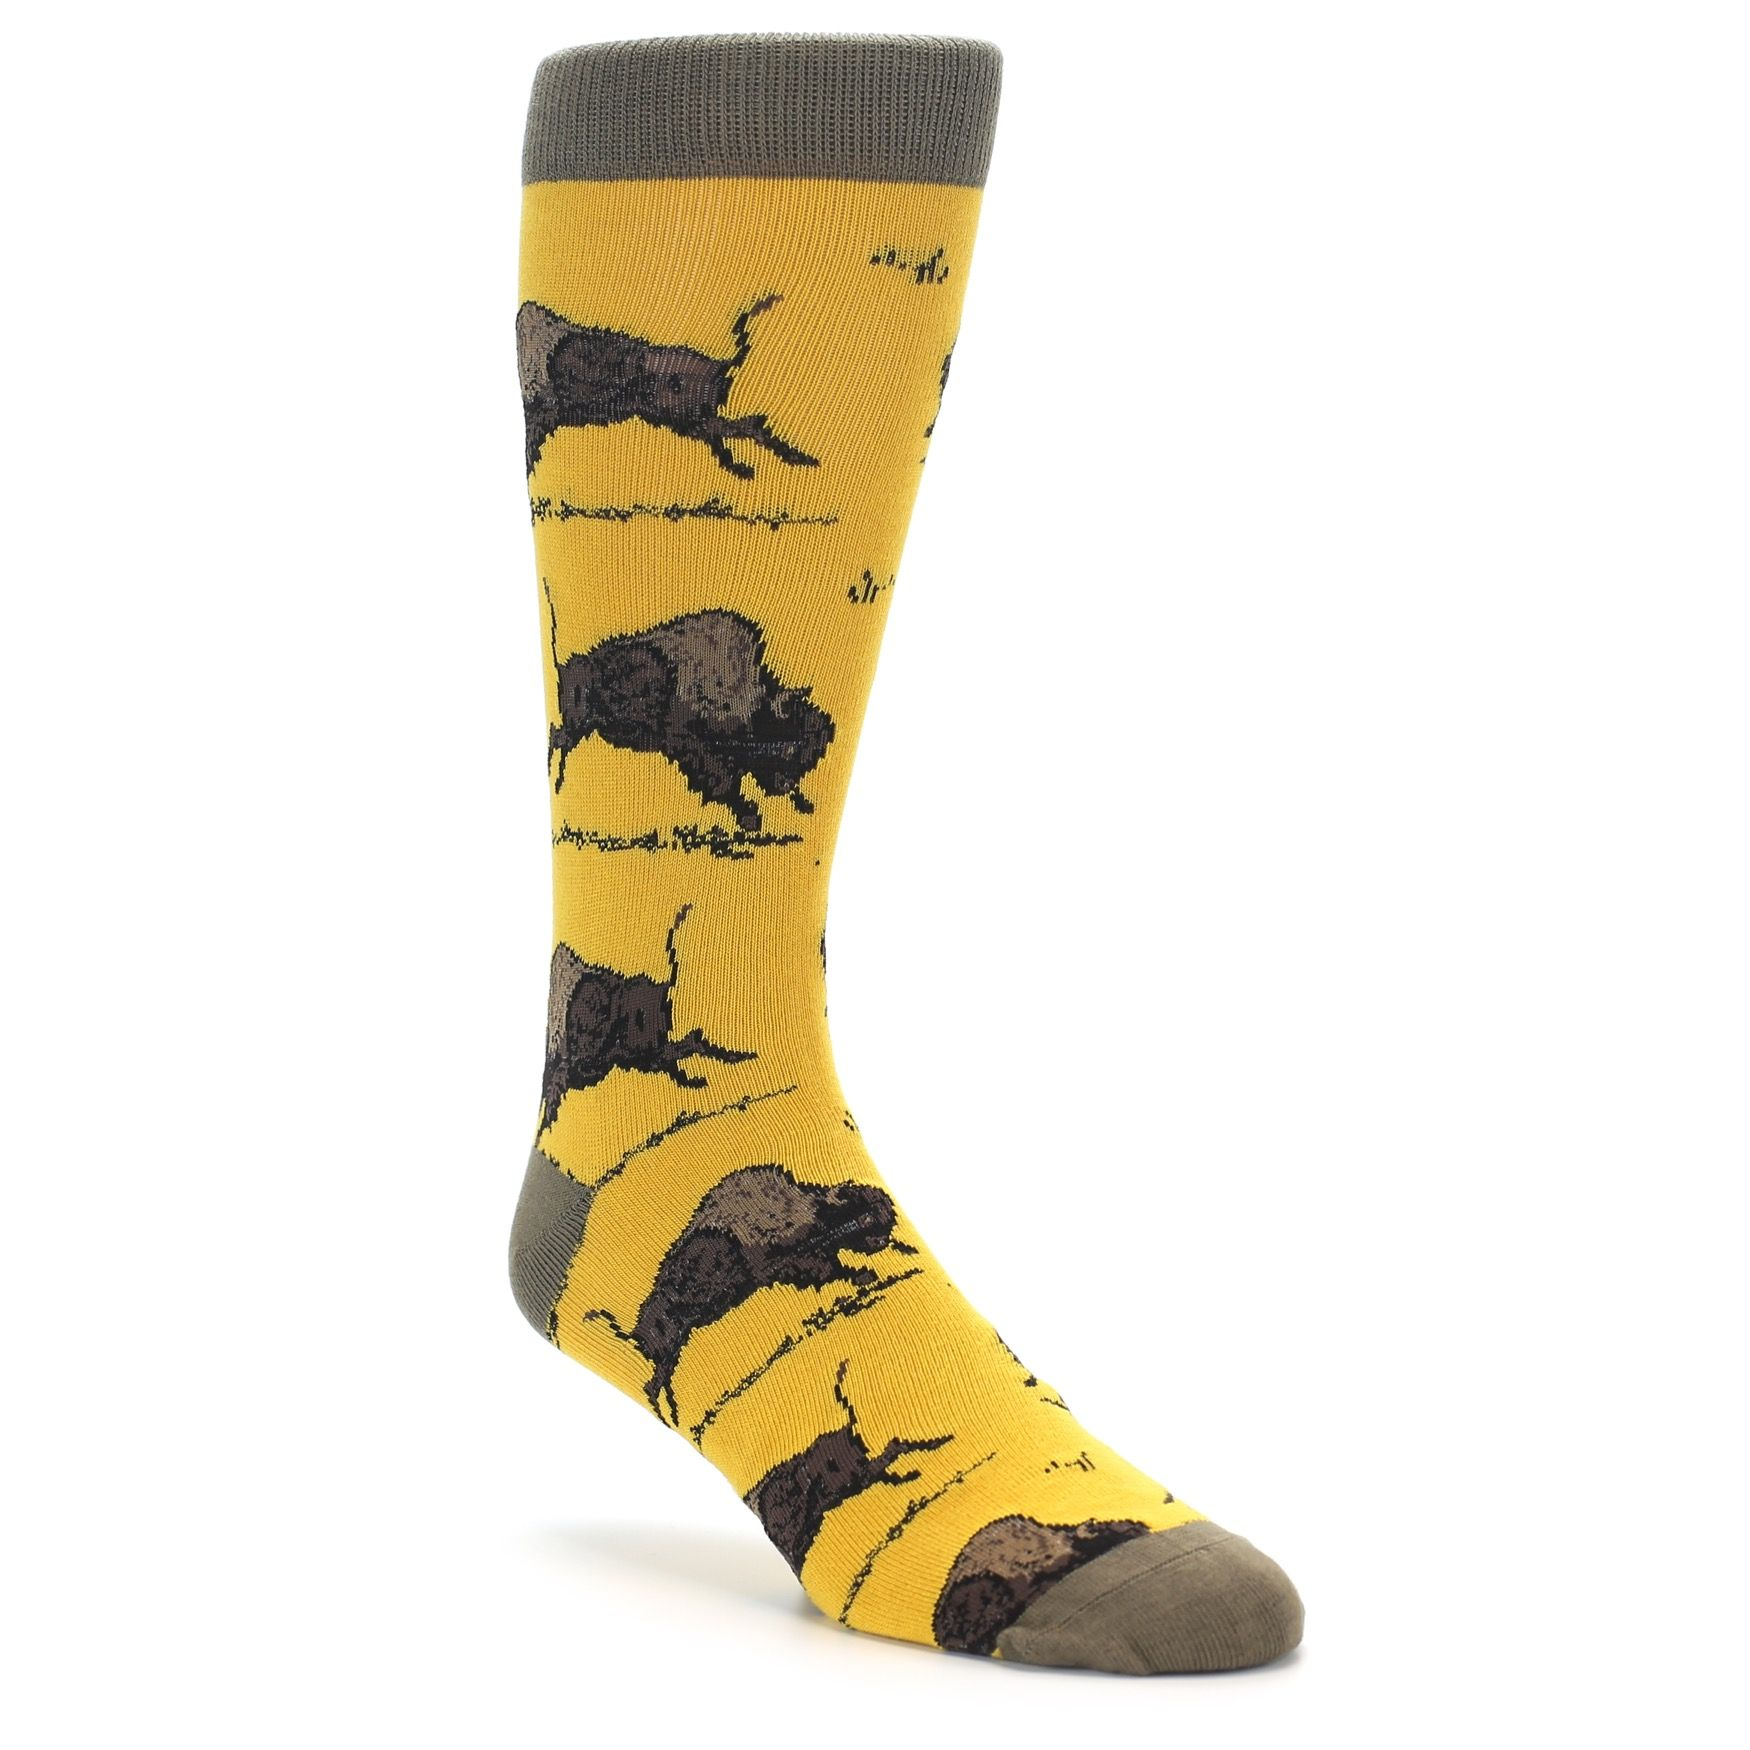 Mustard yellow mens dress socks